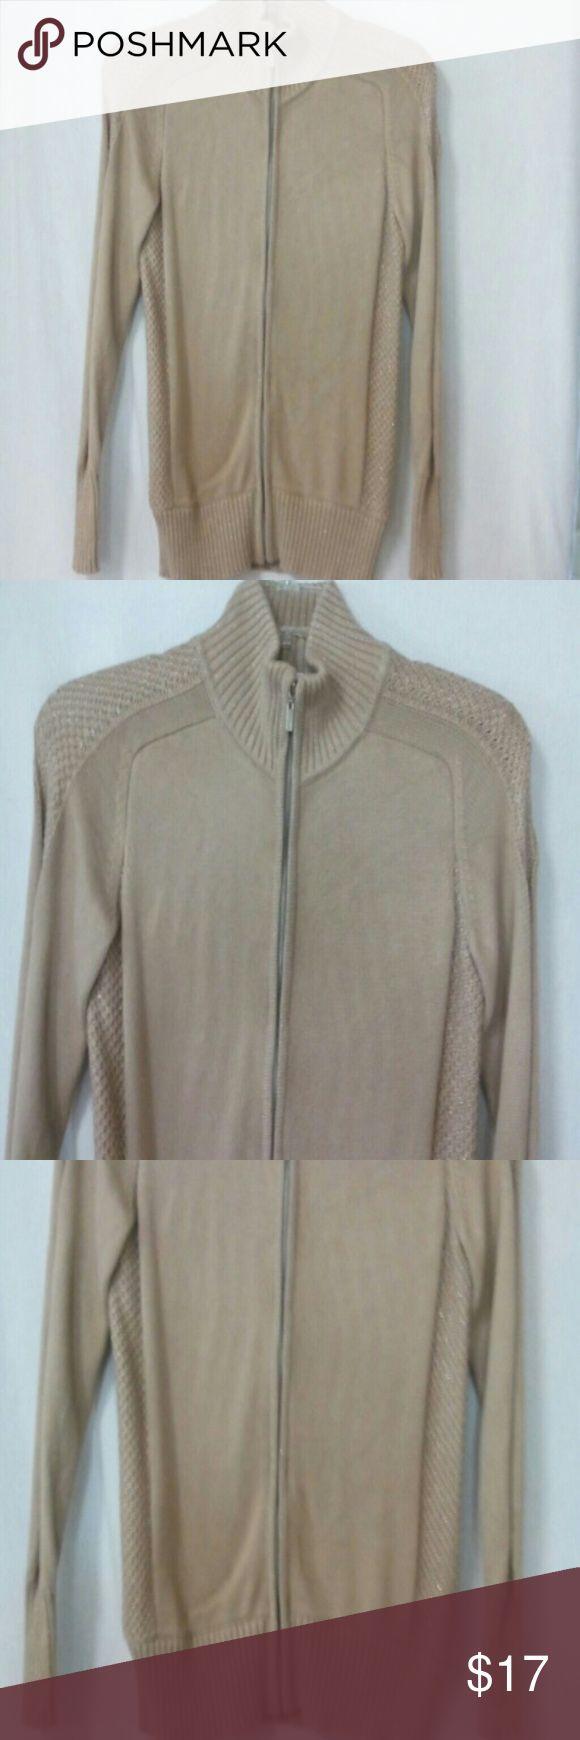 Best 25+ Golf sweaters ideas on Pinterest   Women's golf outfits ...